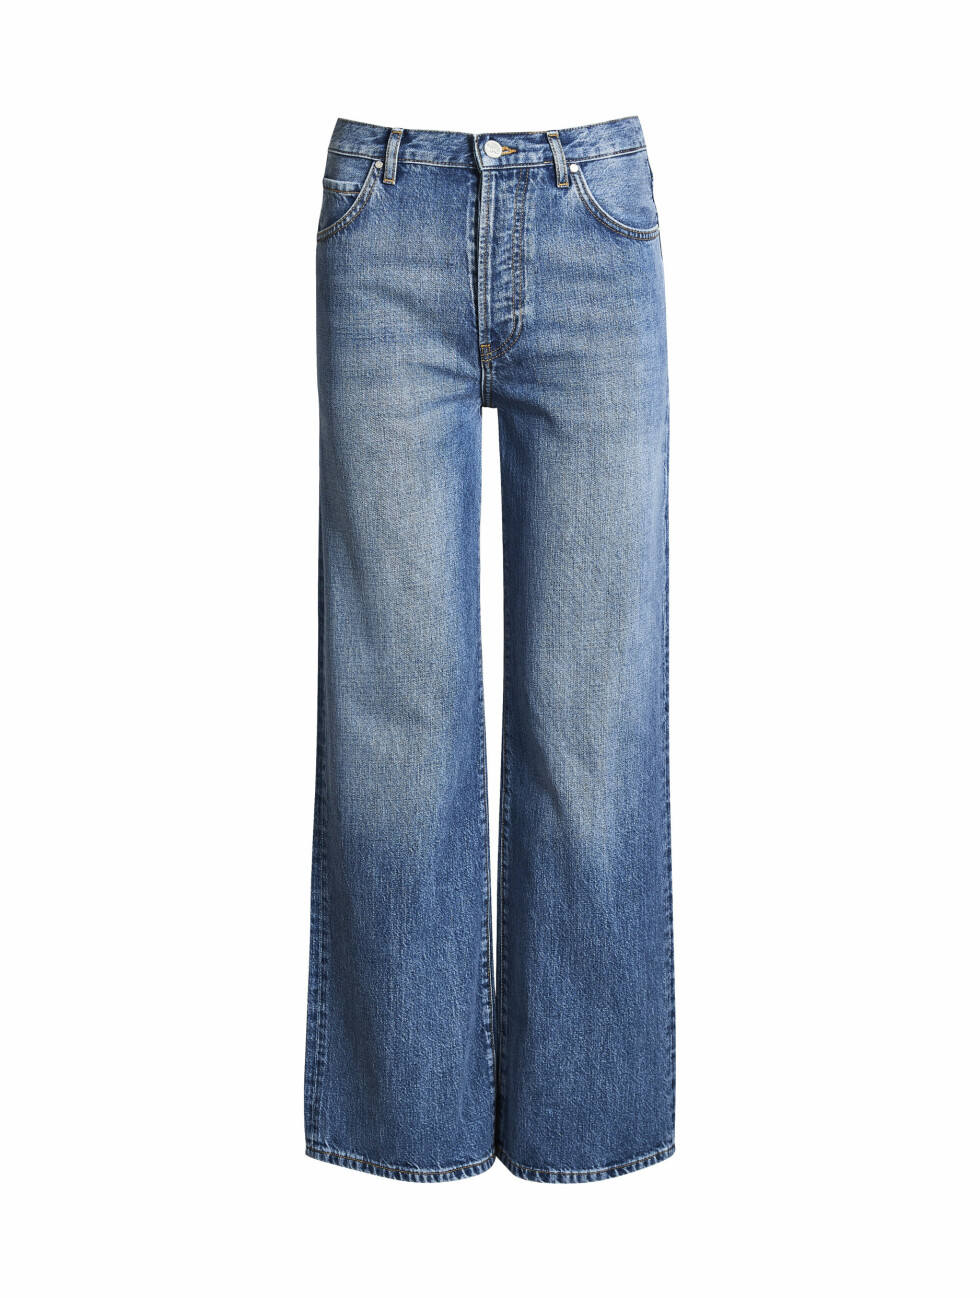 Jeans med sleng (kr 600, Never Denim).